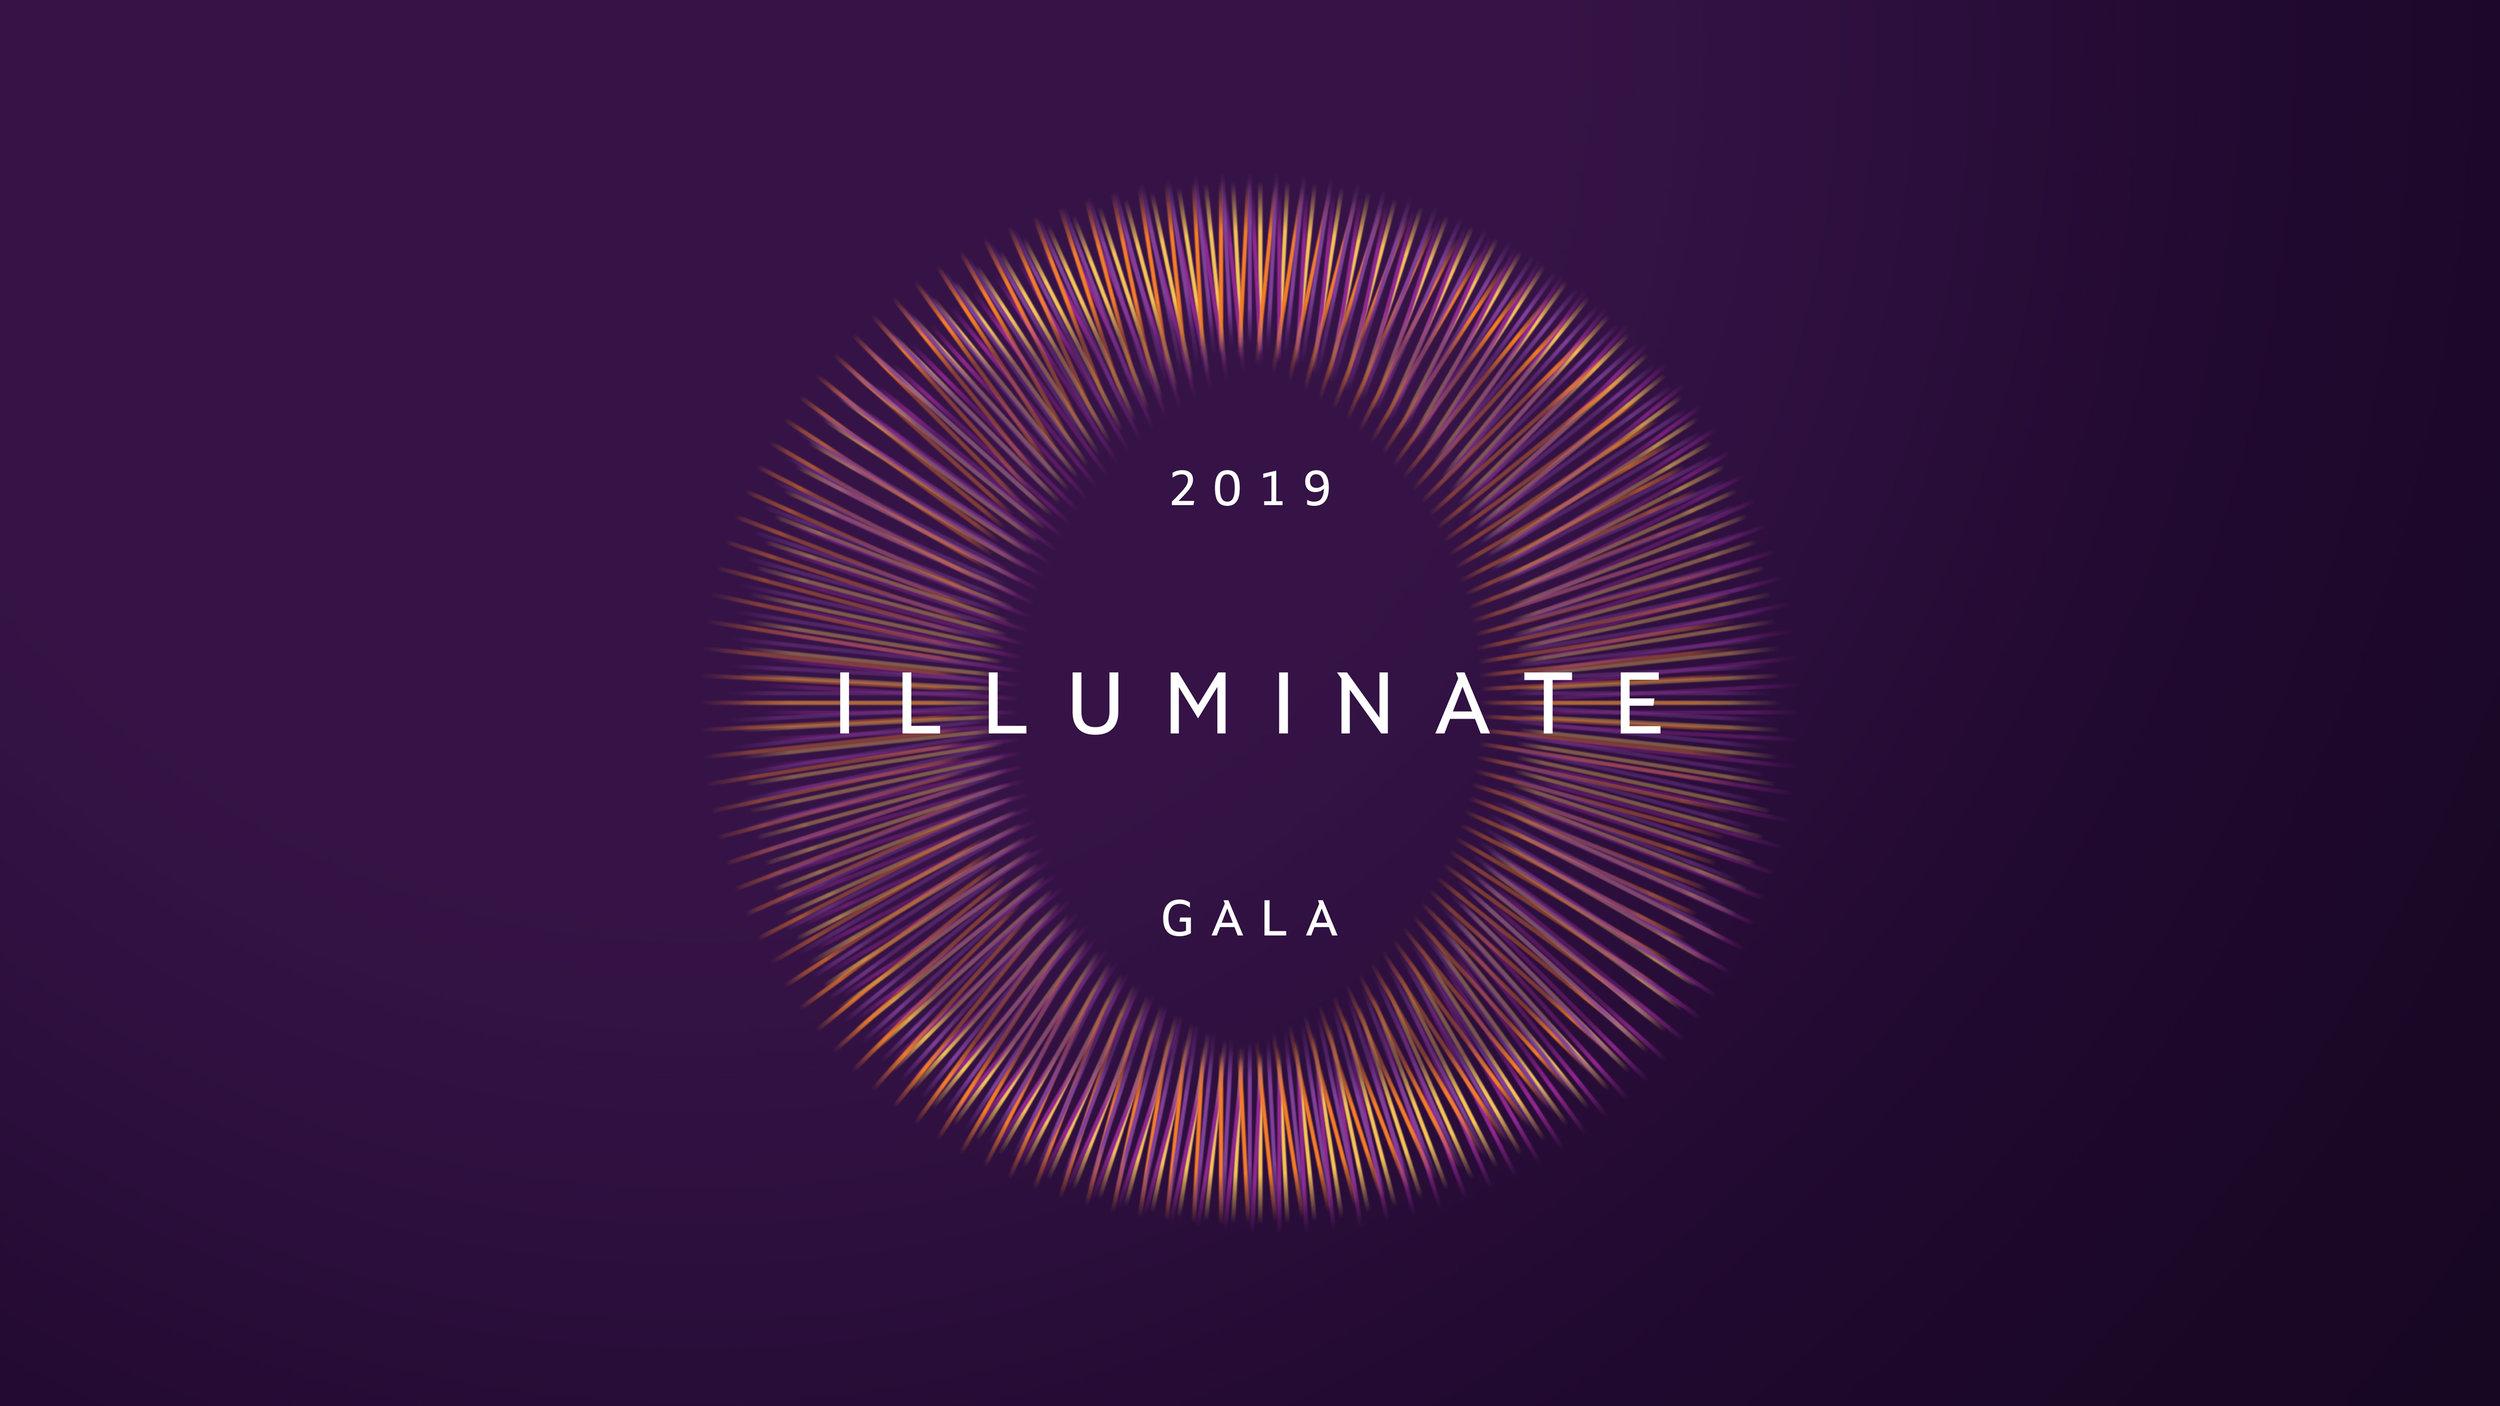 Markus-Wreland-Illuminate-Gala-2019-01.jpg